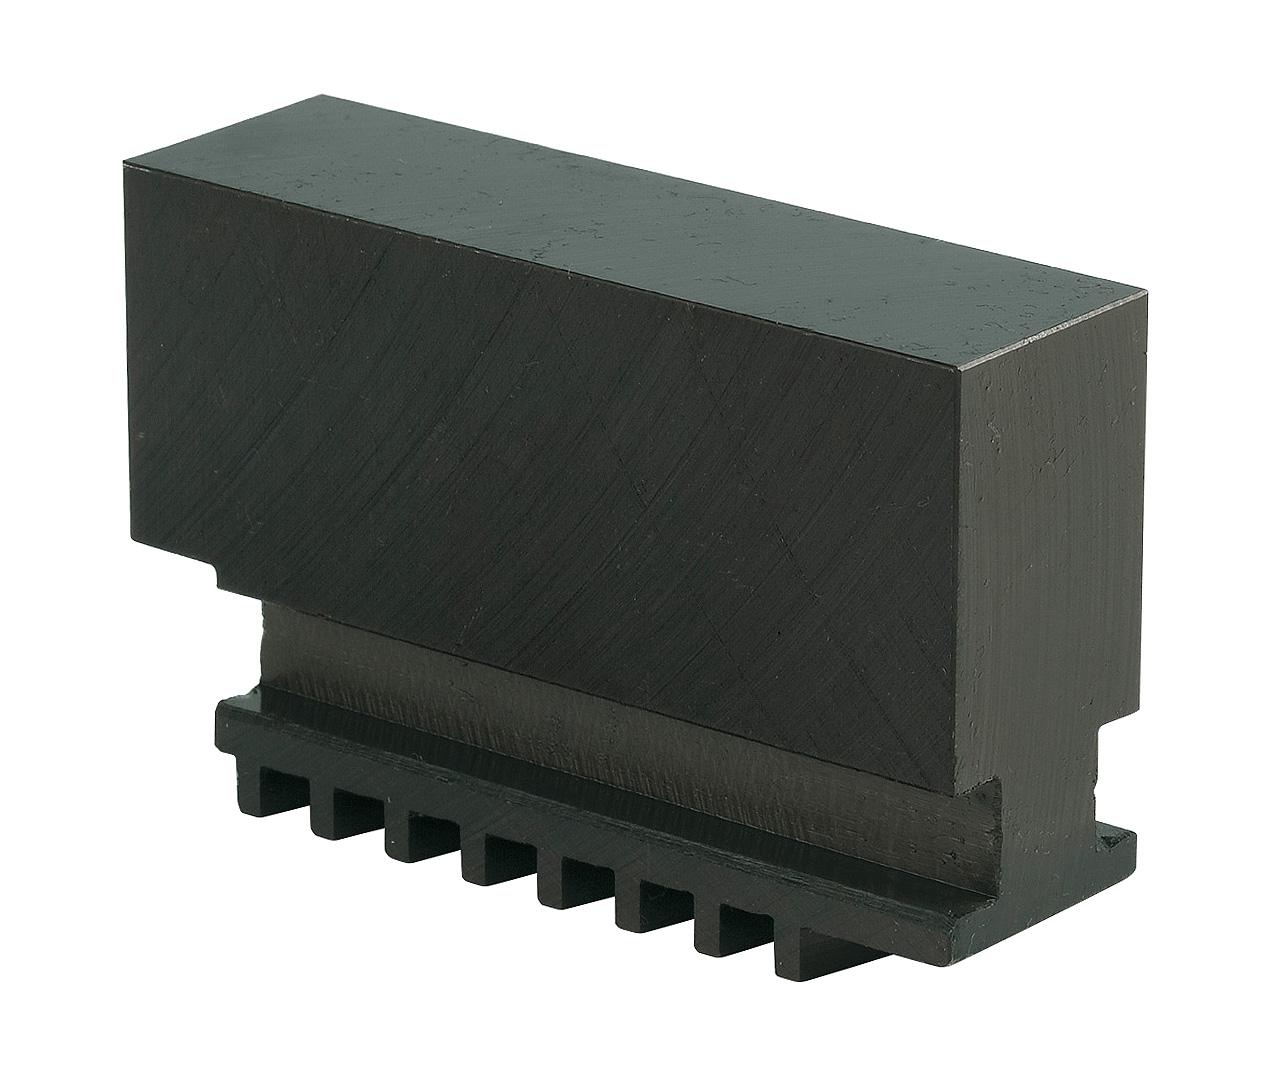 Szczęki jednolite miękkie - komplet DSJ-DK12-160 BERNARDO